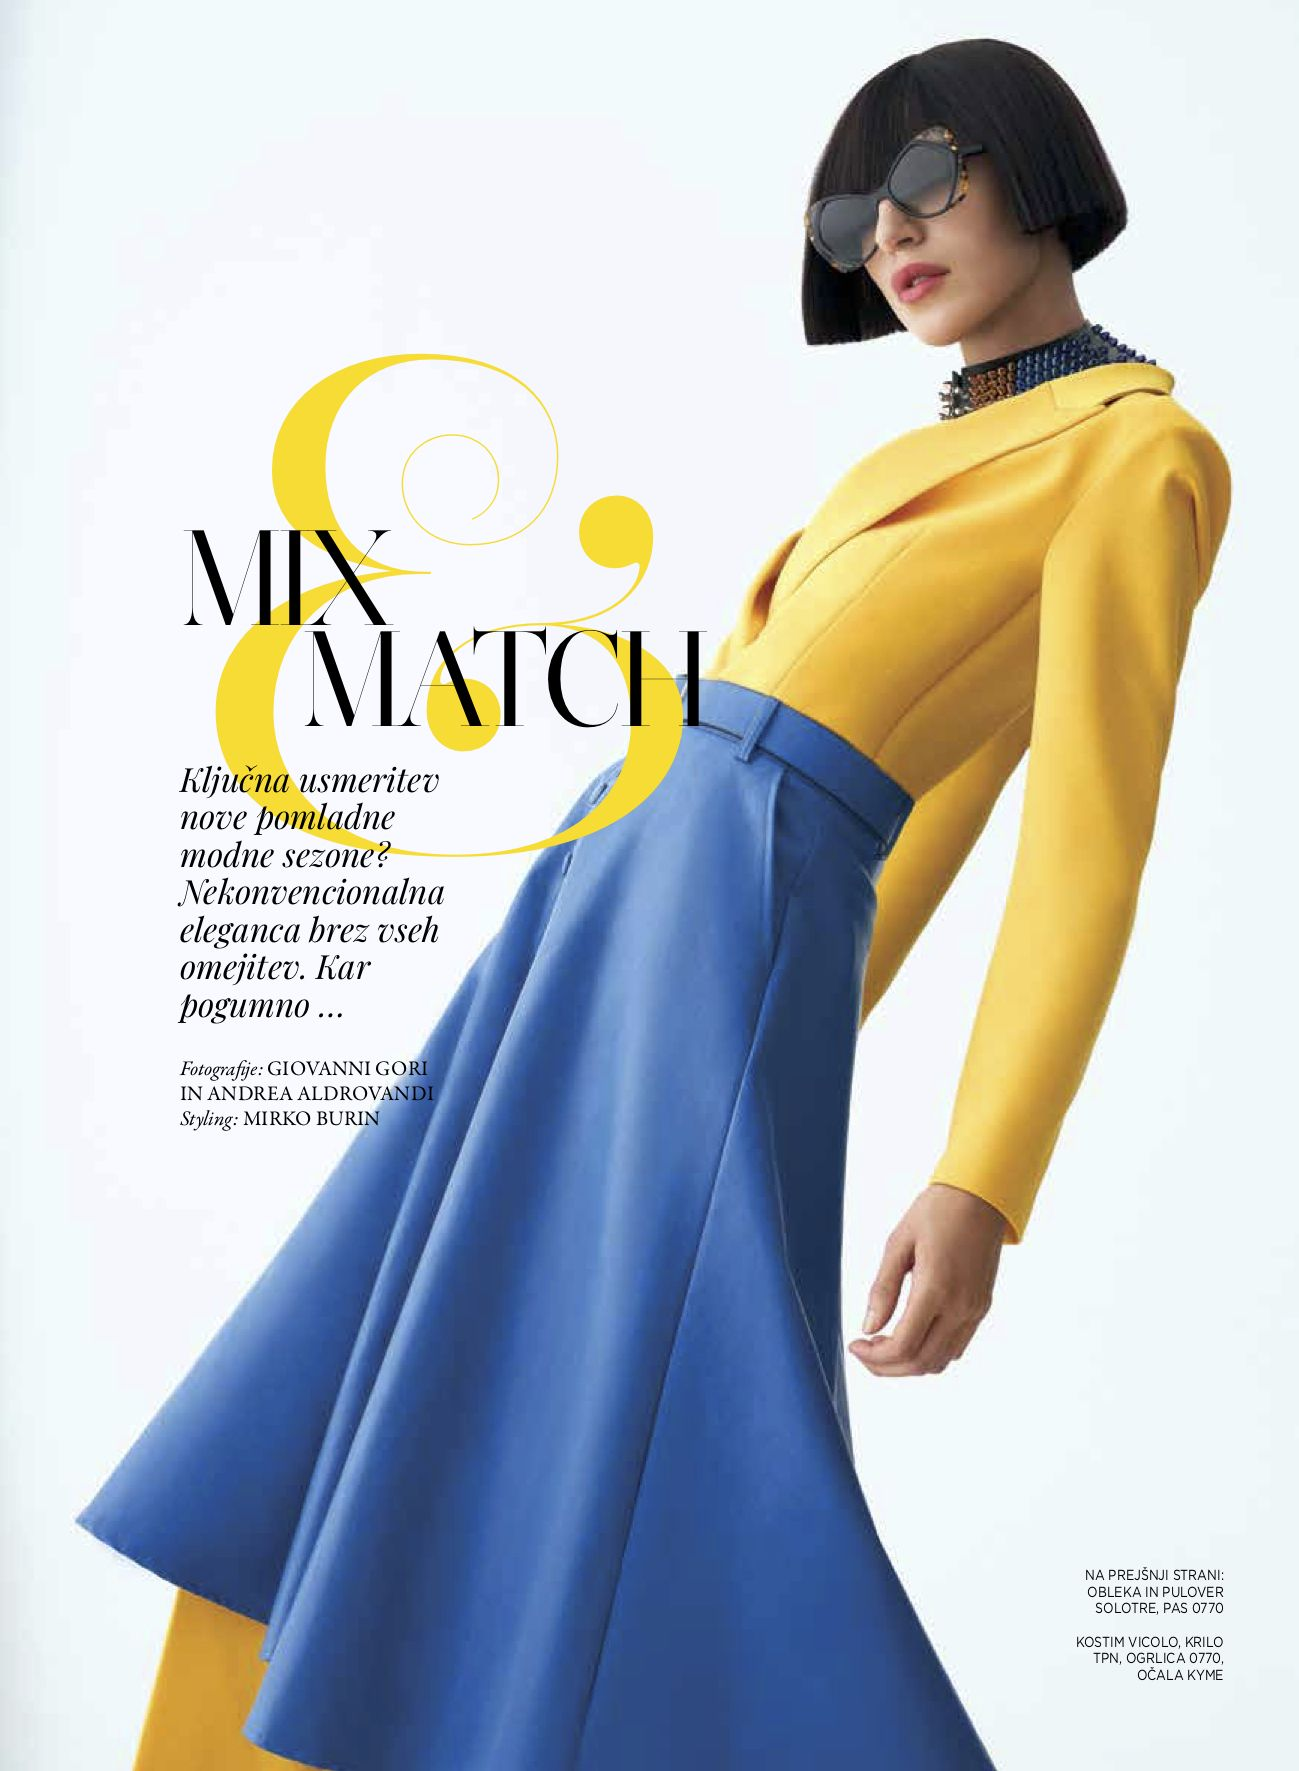 Gloss Magazine Cover - Pic. 3